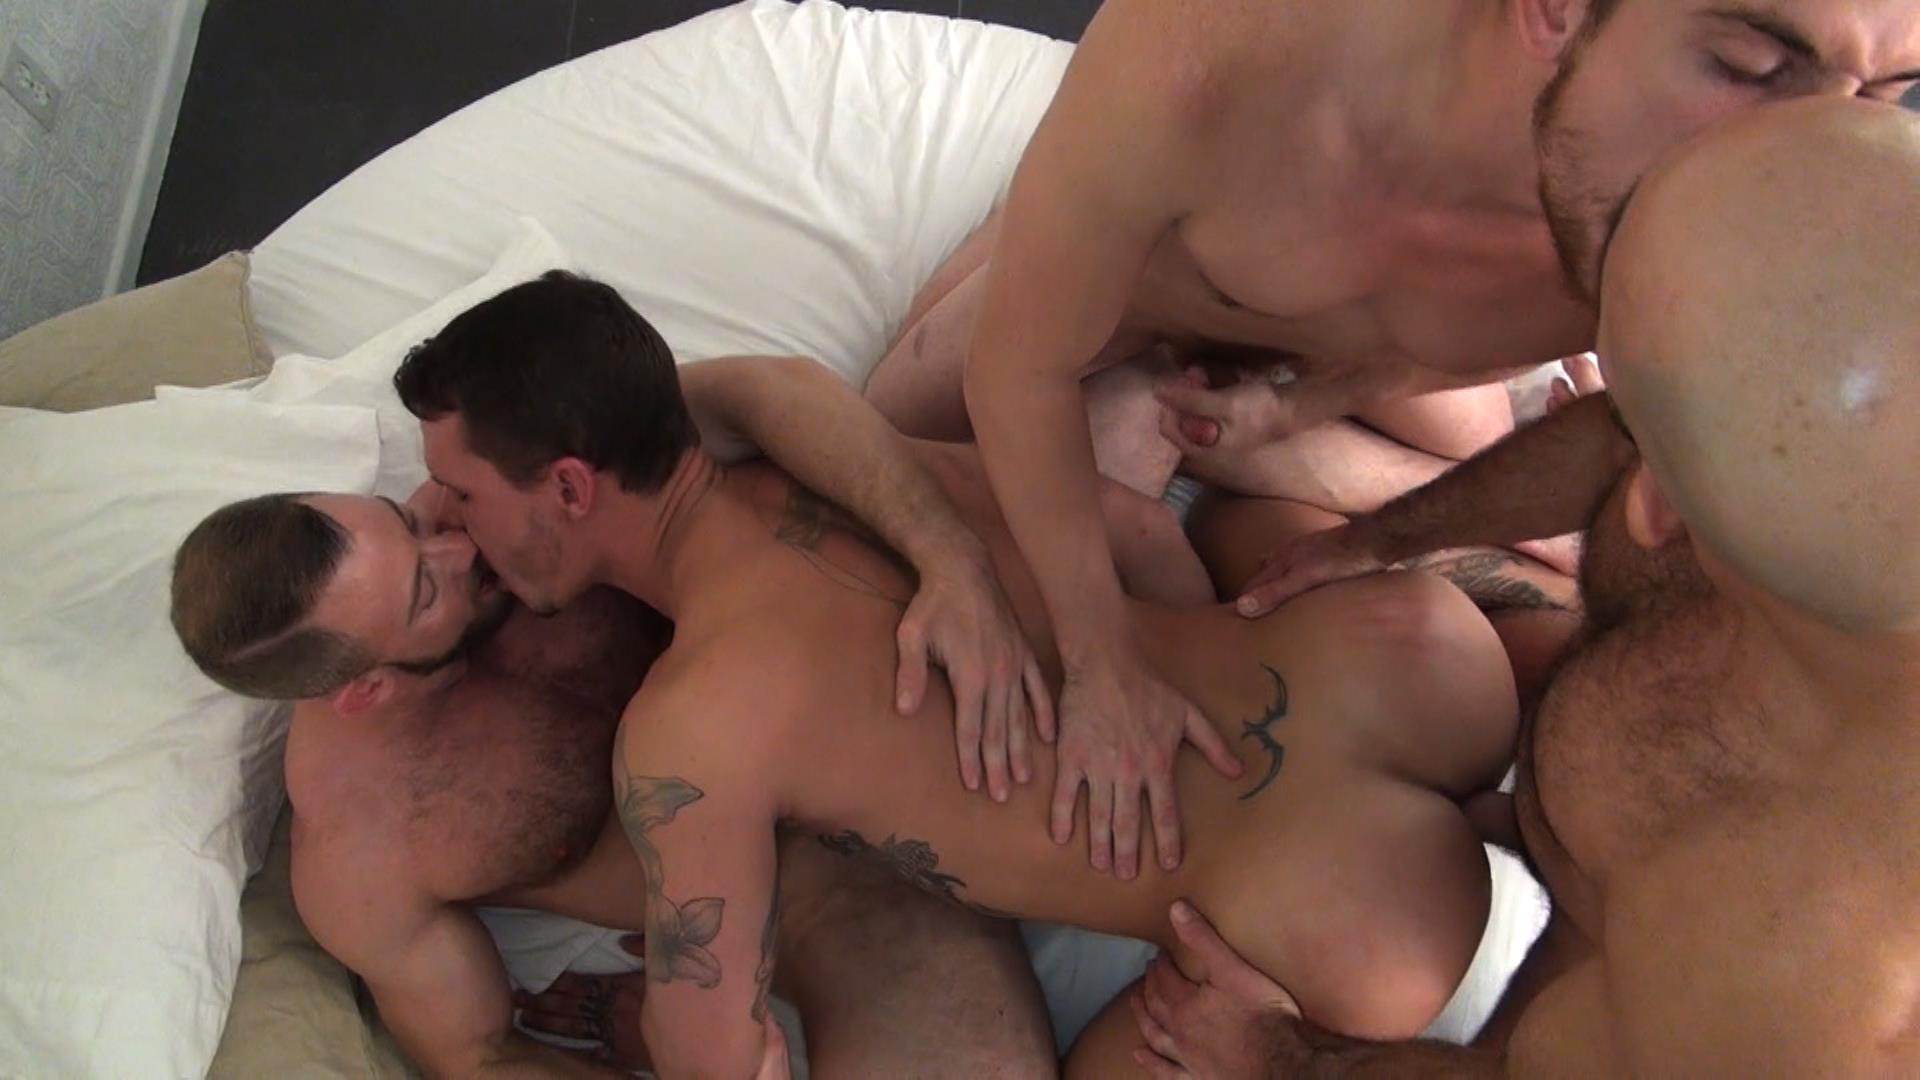 Raw-Fuck-Club-Dayton-OConnor-Tate-Ryder-Shay-Michaels-Adam-Russo-Bareback-Breeding-Amateur-Gay-Porn-7 Tate Ryder Gets Three Hairy Muscle Daddy Bareback Cocks